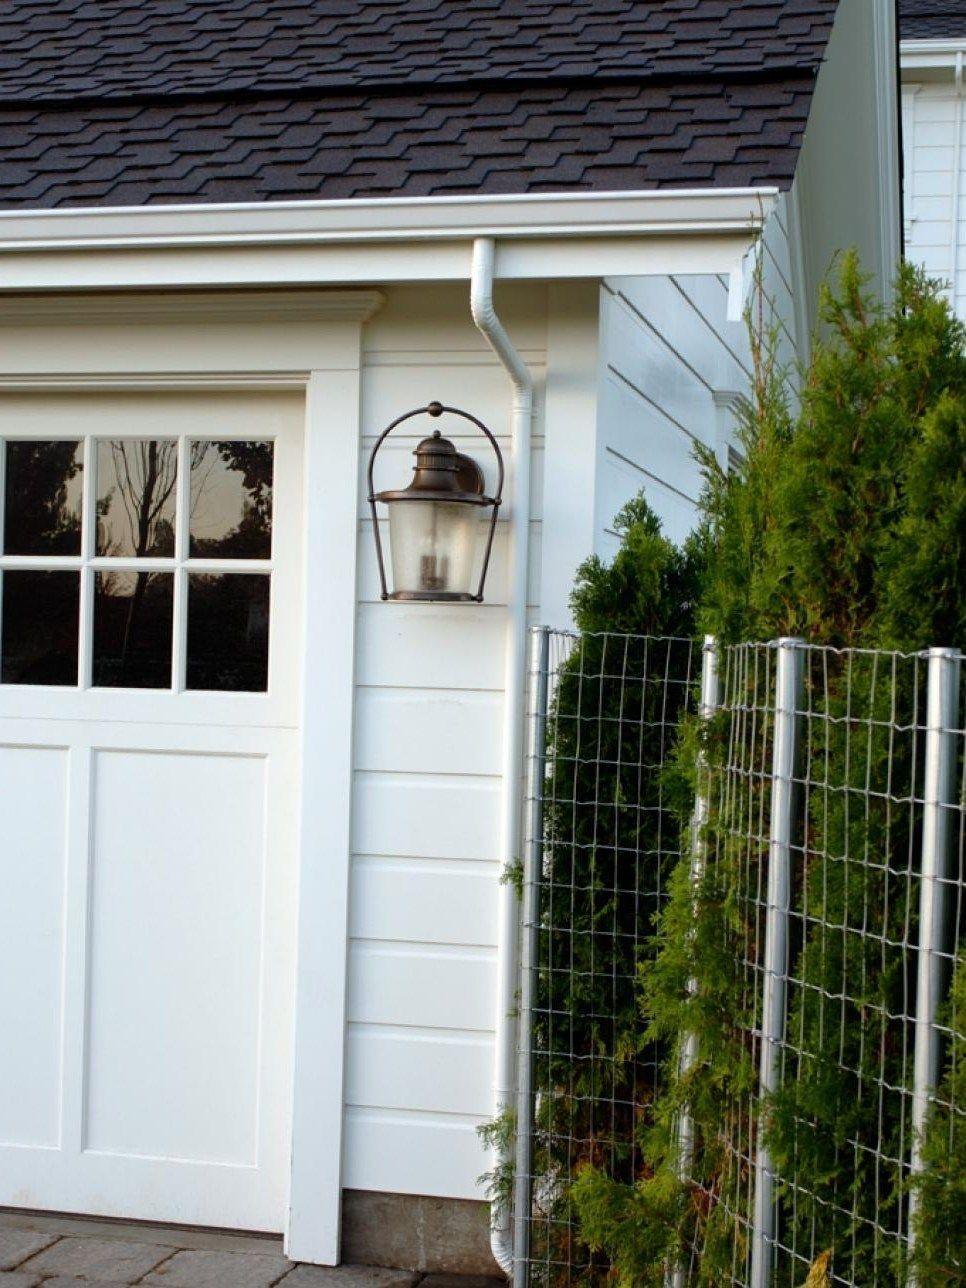 Cottage Outdoor Lighting Cottage Lighting Outdoor Cottage Lighting Lightingc Cottage Lighting In 2020 Cottage Outdoor Rustic Outdoor Lighting Outdoor Lighting